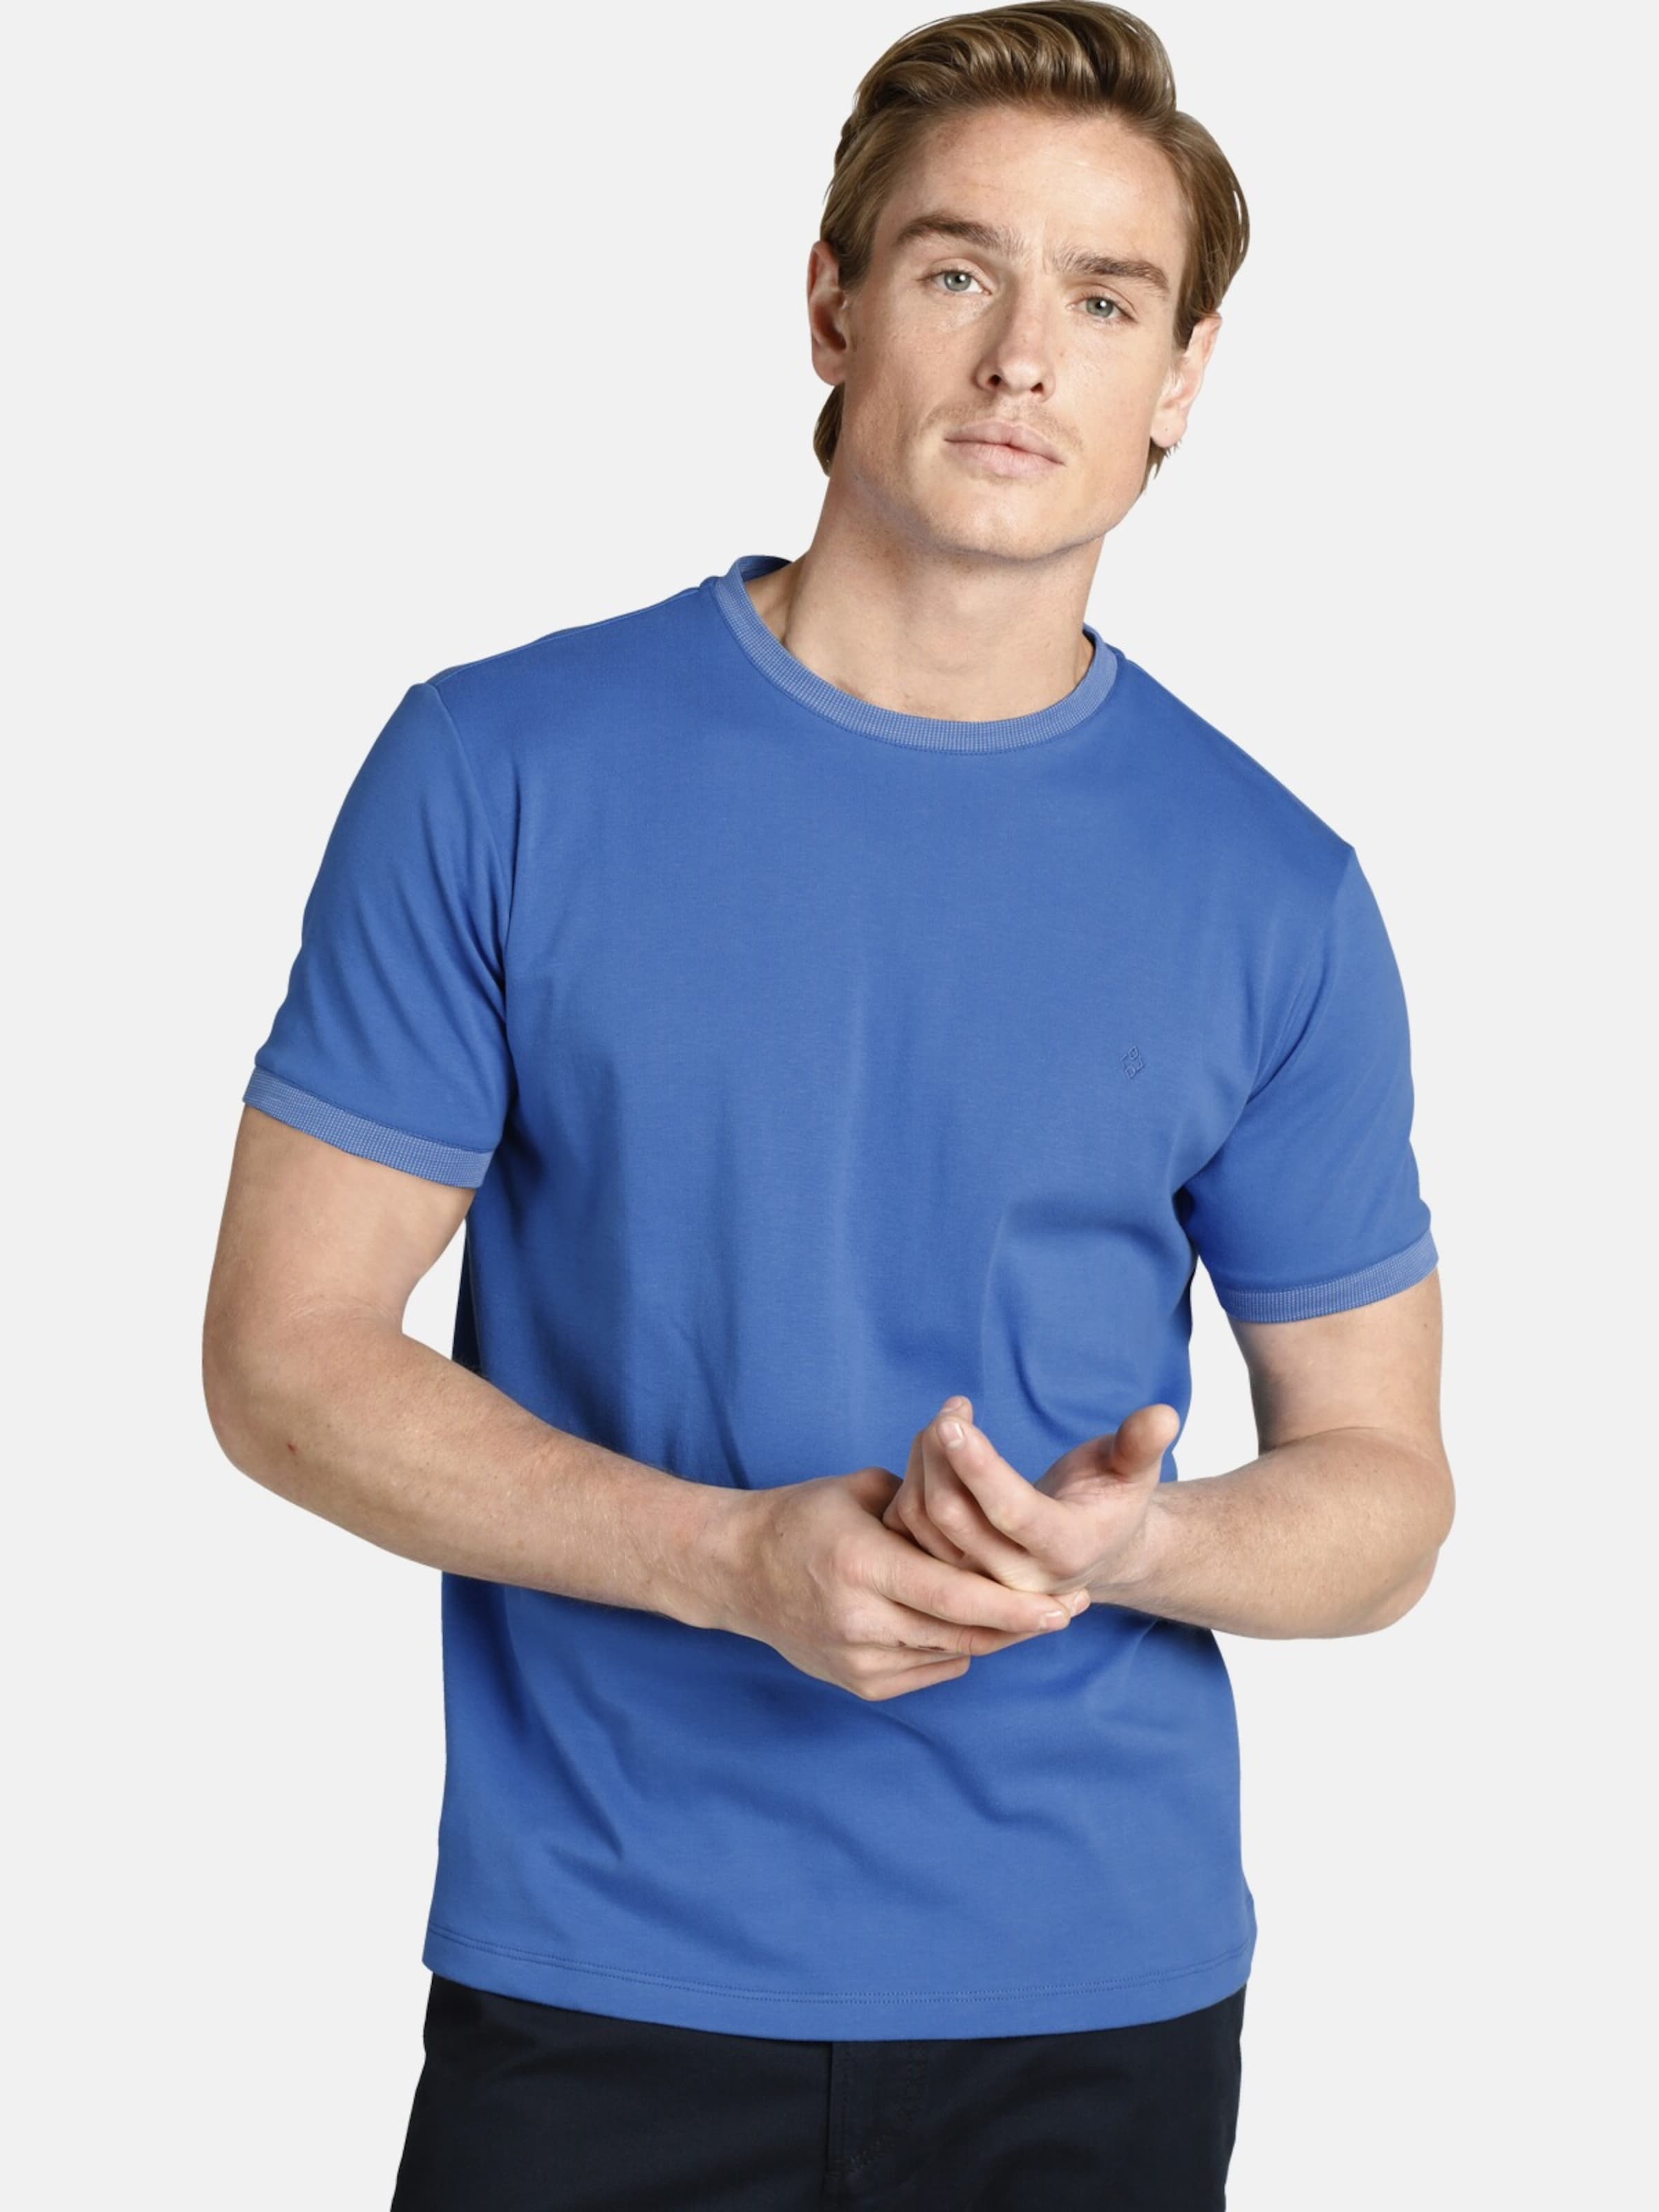 Charles Colby T-Shirt 'Duke Enne' in royalblau Gerader Saum C11801-0001